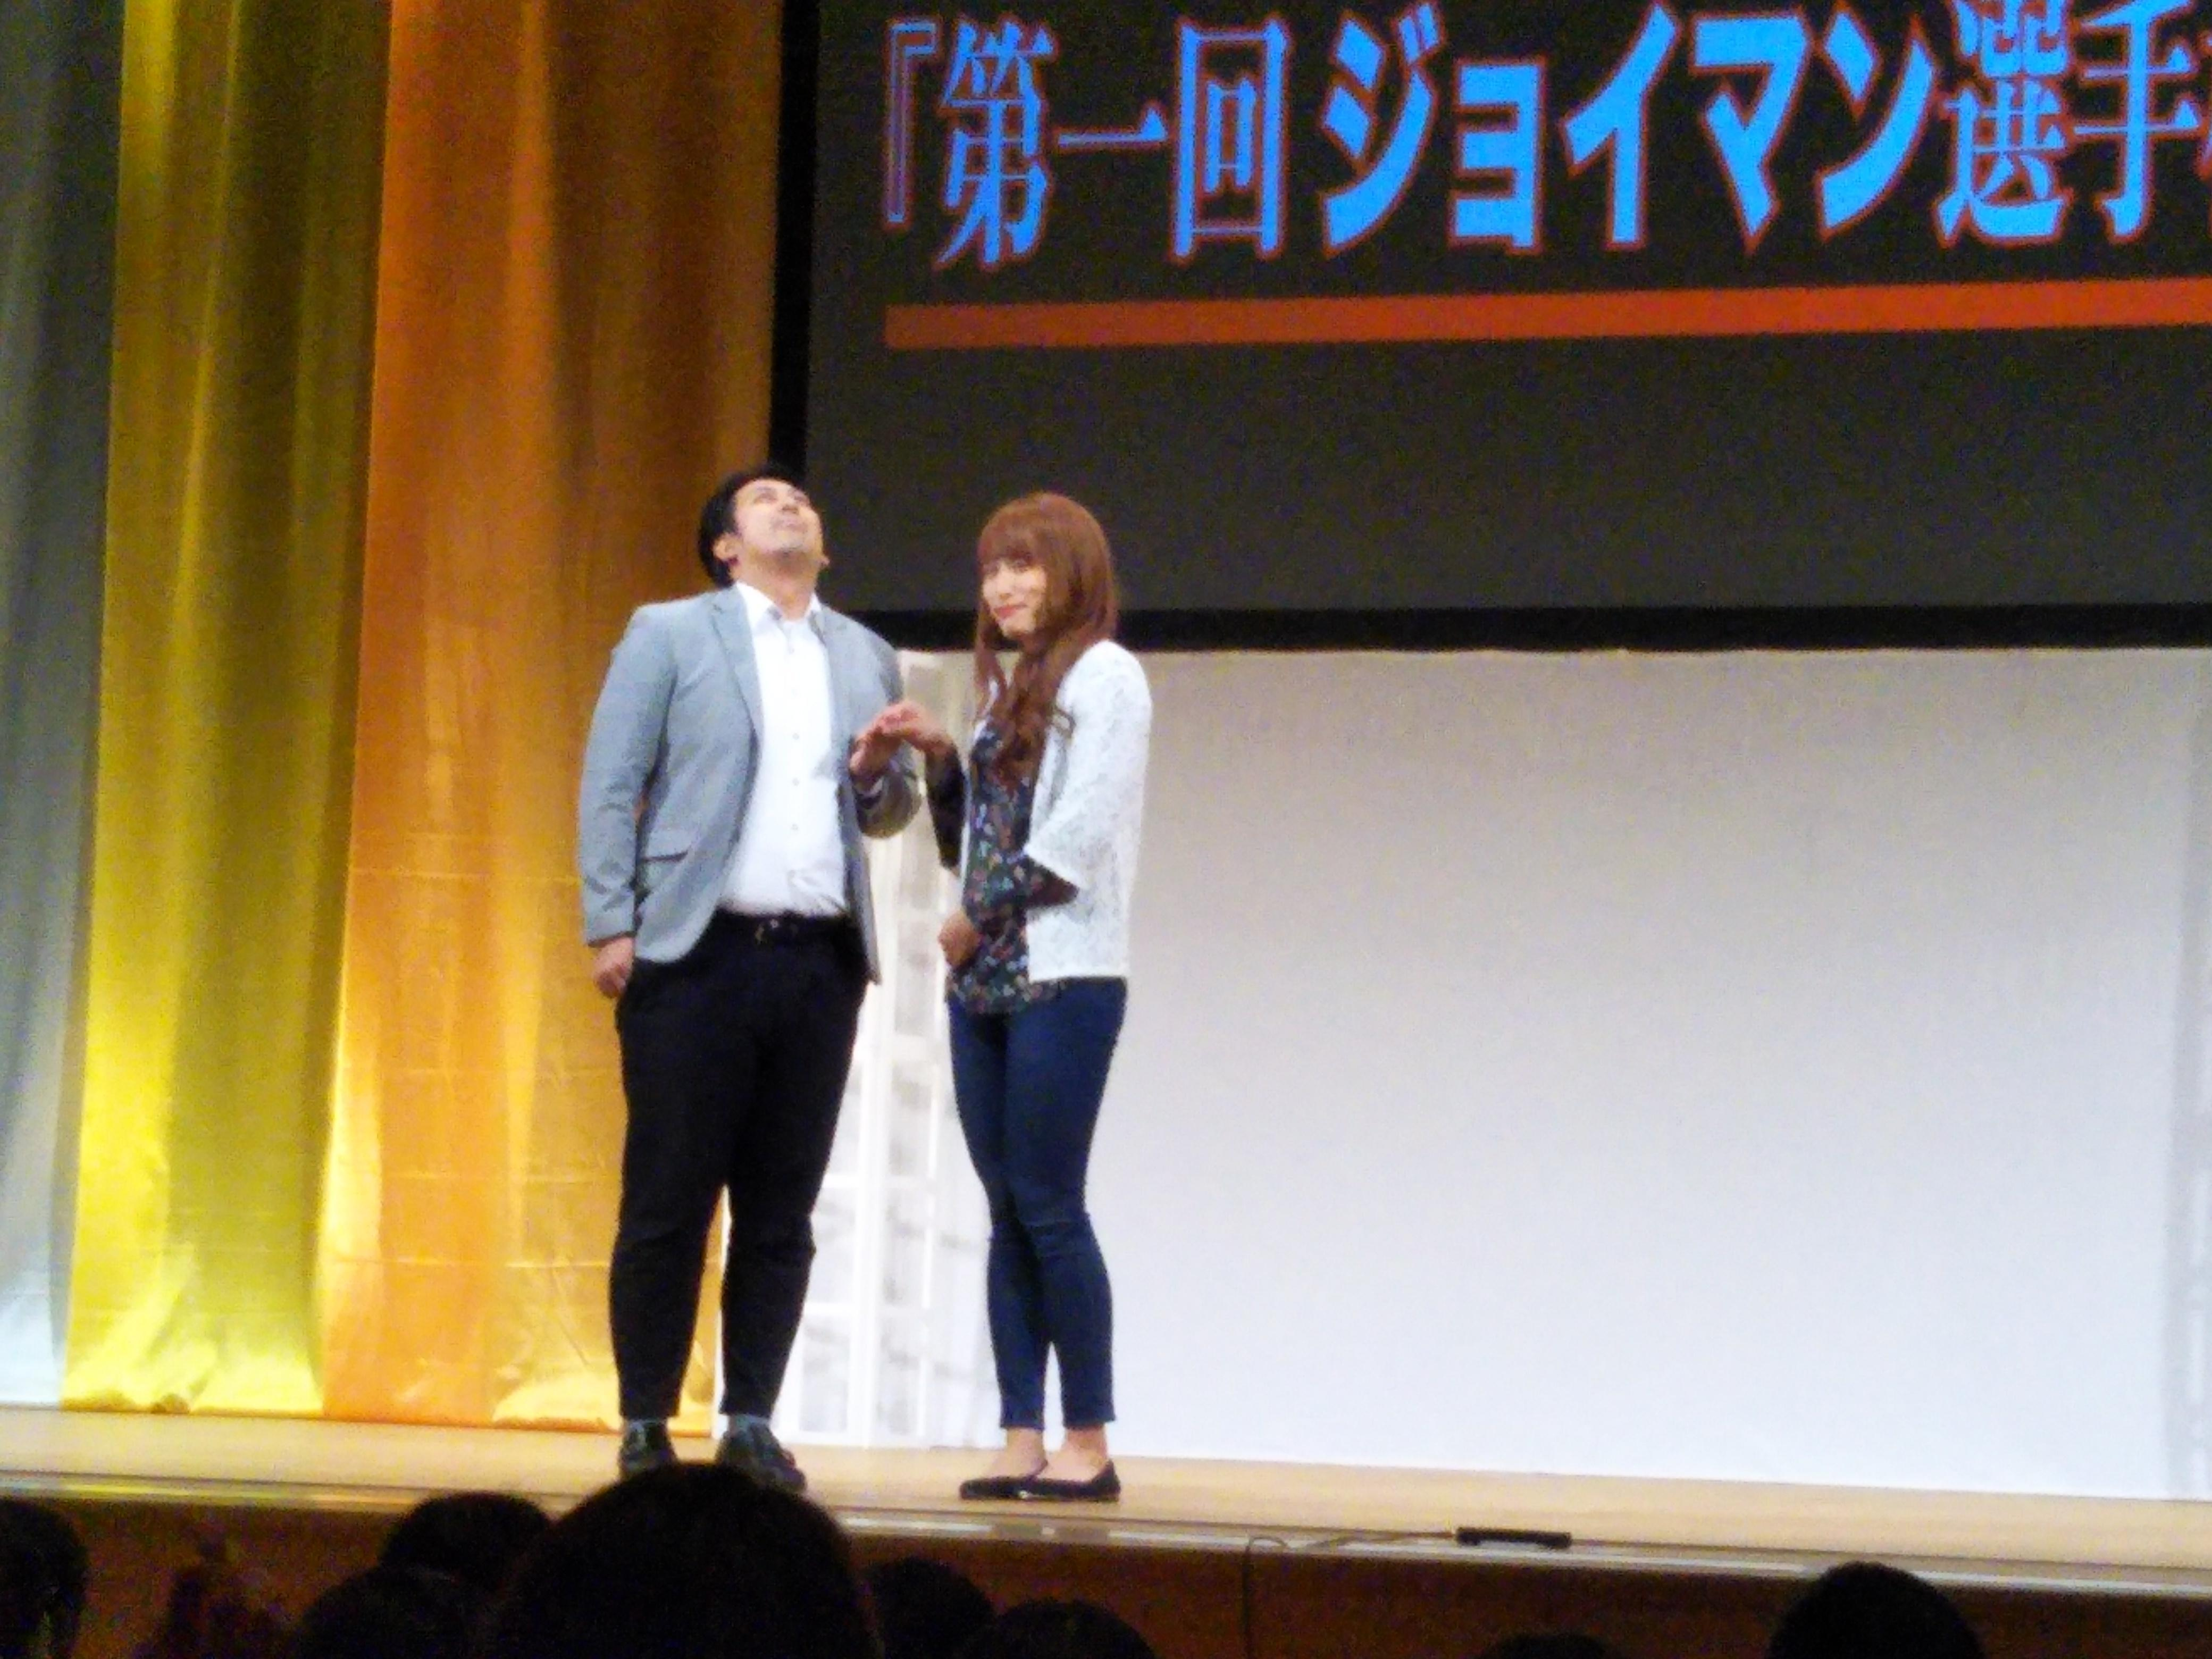 http://news.yoshimoto.co.jp/20180831104319-1b4c06346d294b6f66f43adfbbf8626f7ff0046e.jpg